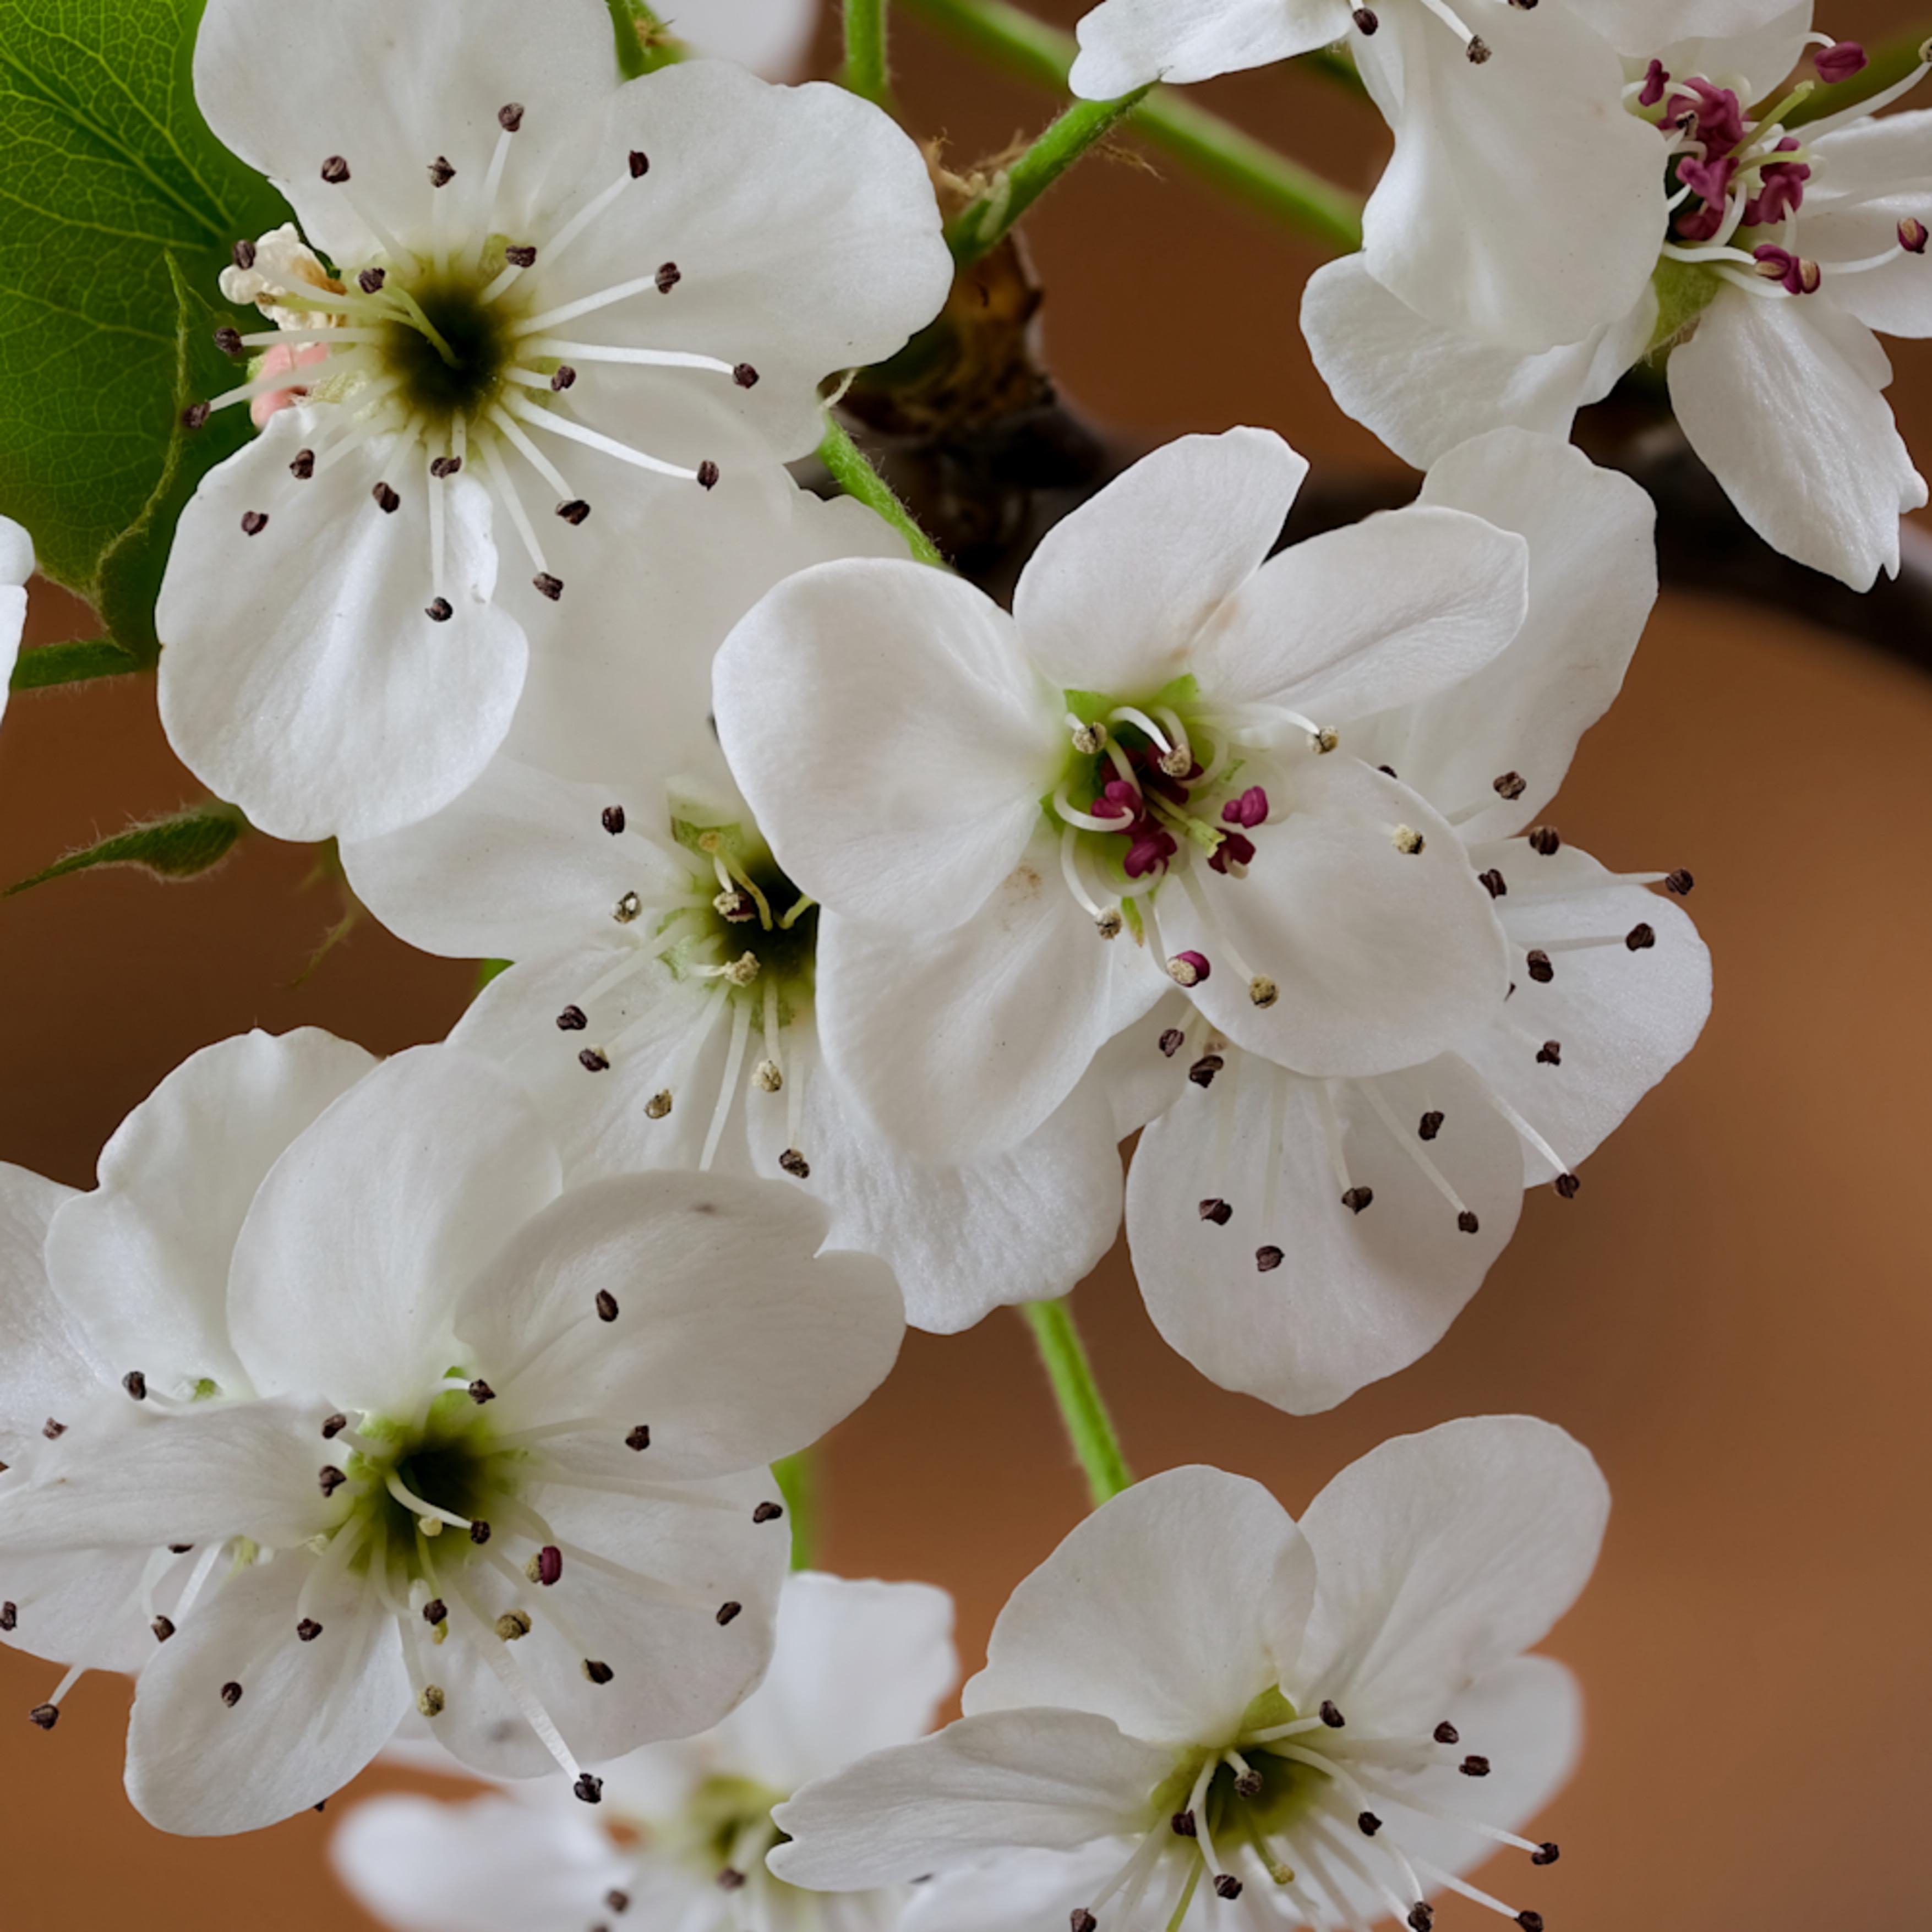 Blossoms focus 5 lqbo10